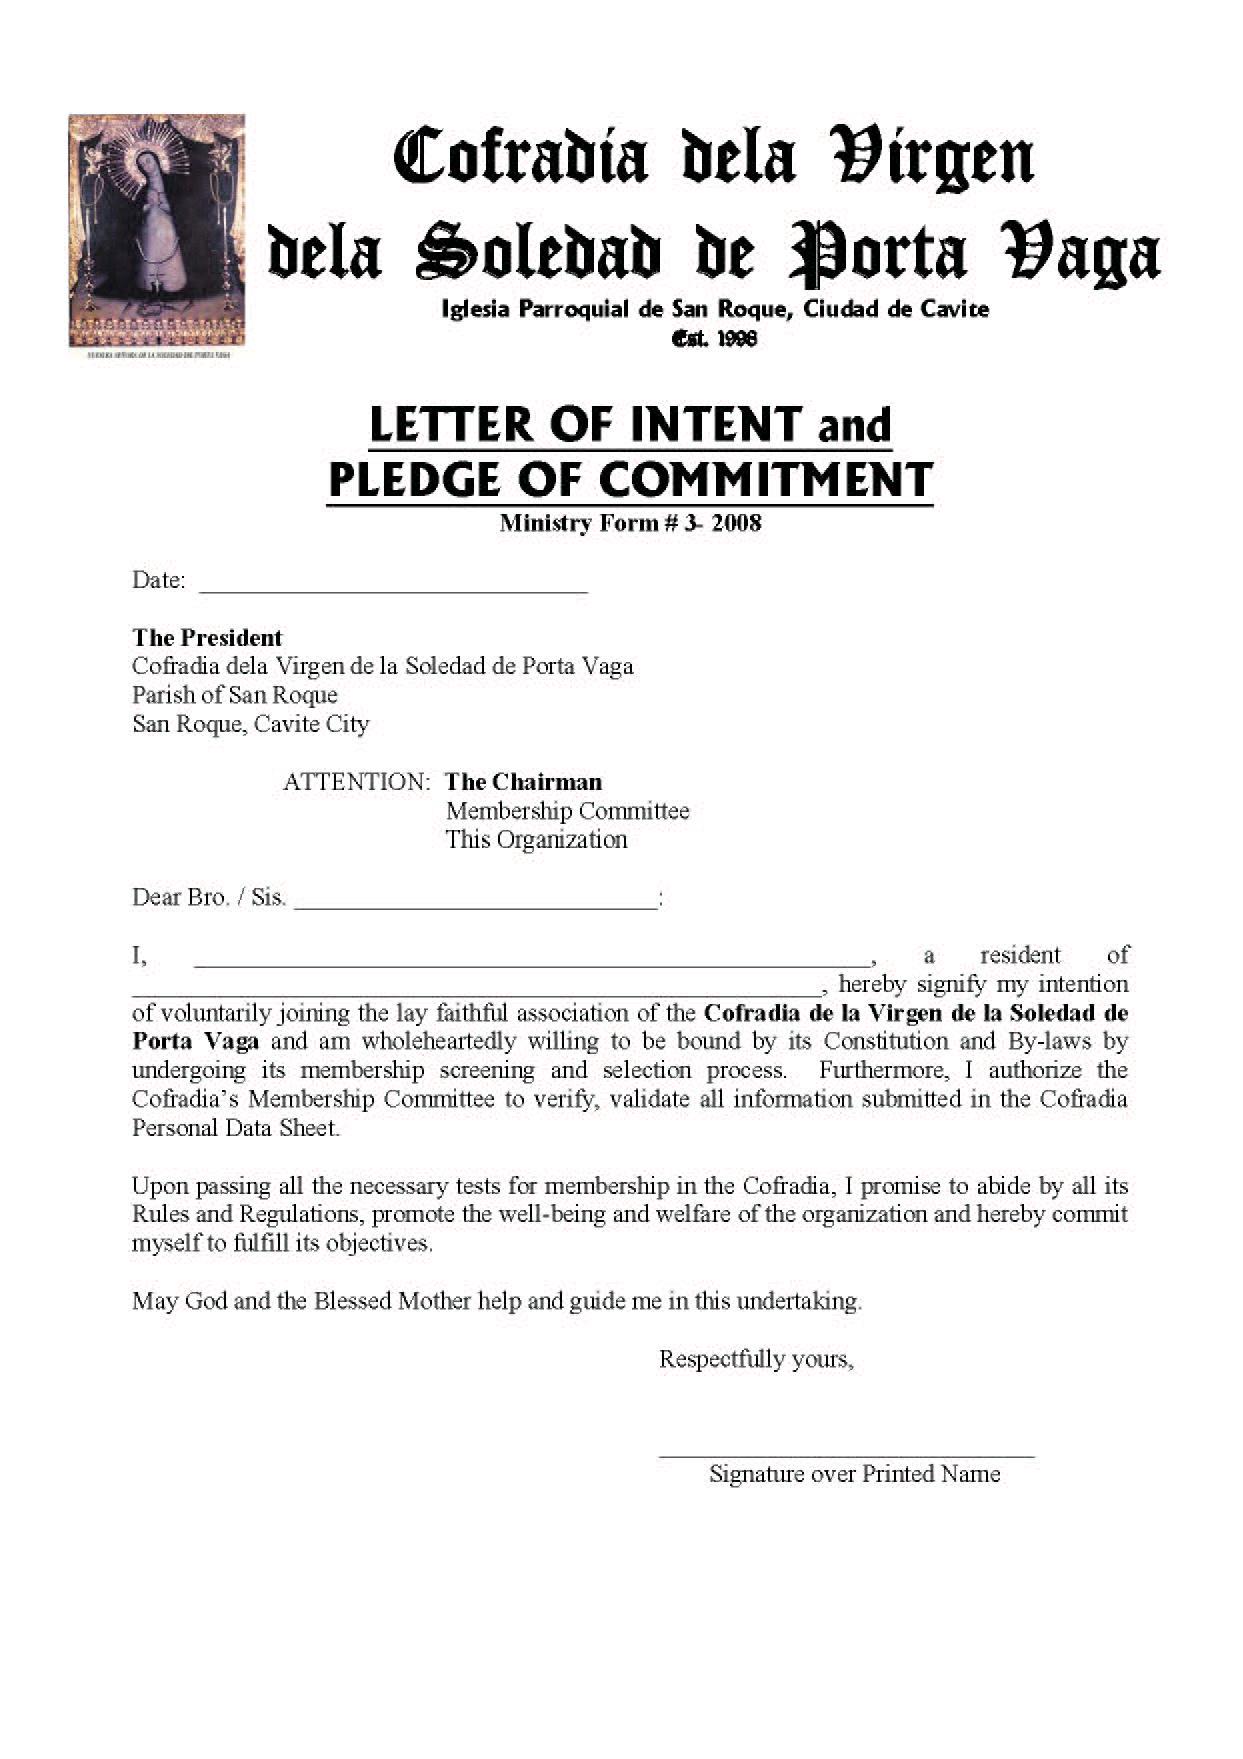 letter of intent-SOLEDAD